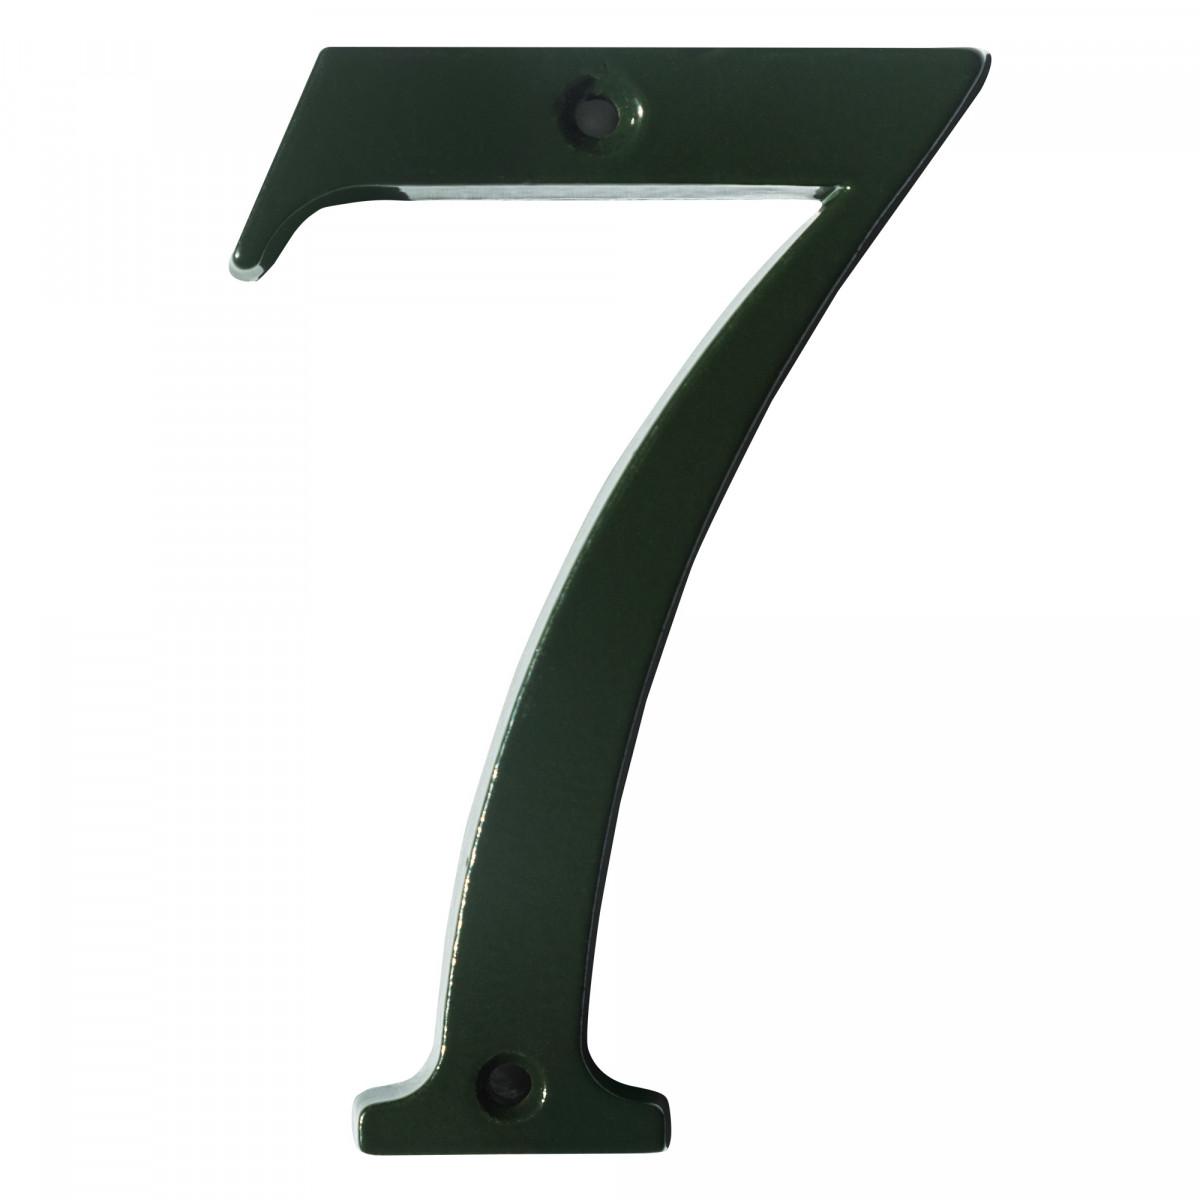 Huisnummer 7 (5857) - KS Verlichting - Huisnummers